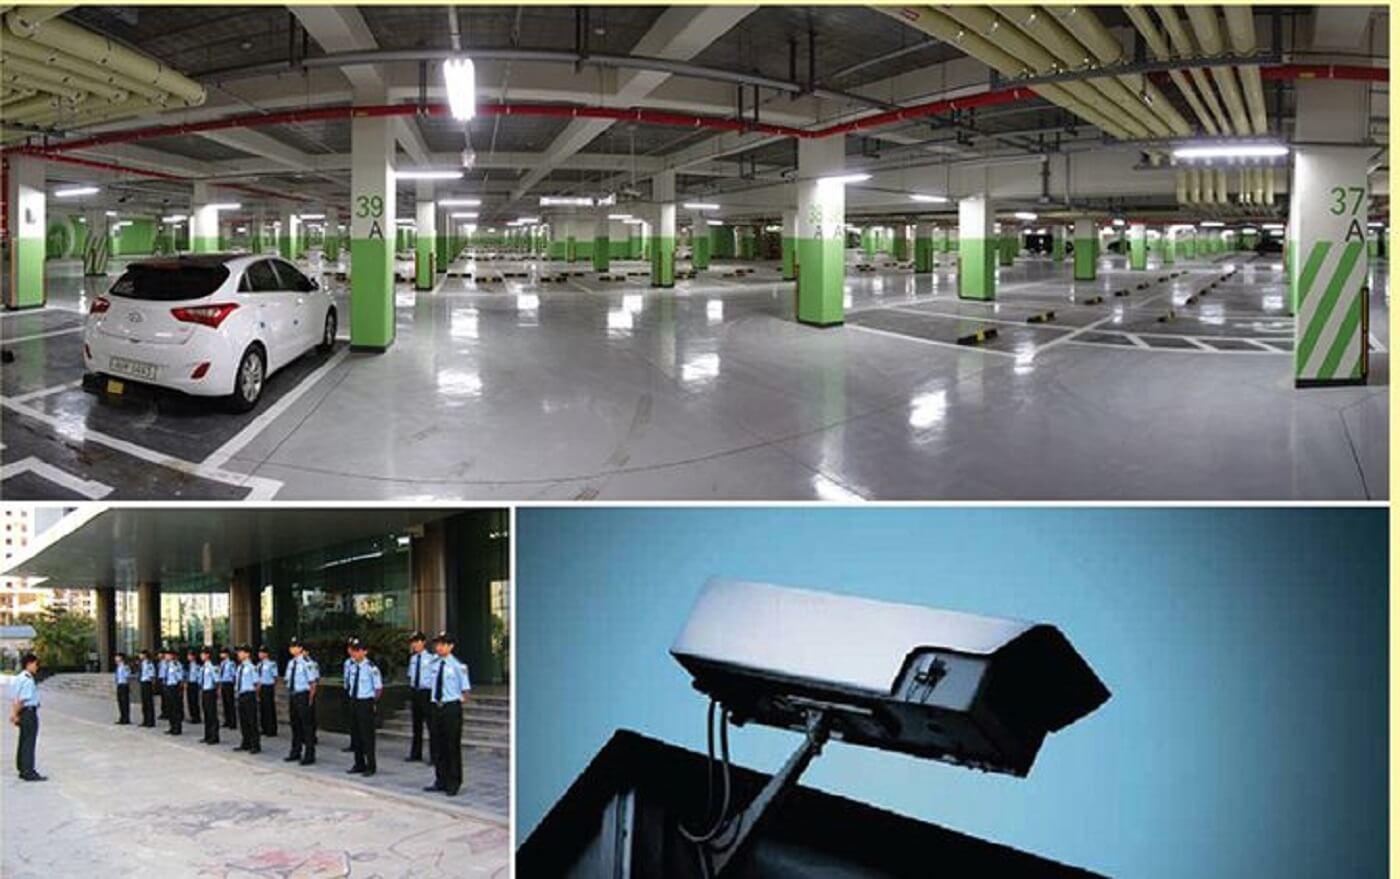 Hệ thống an ninh đảm bảo 622 Minh Khai